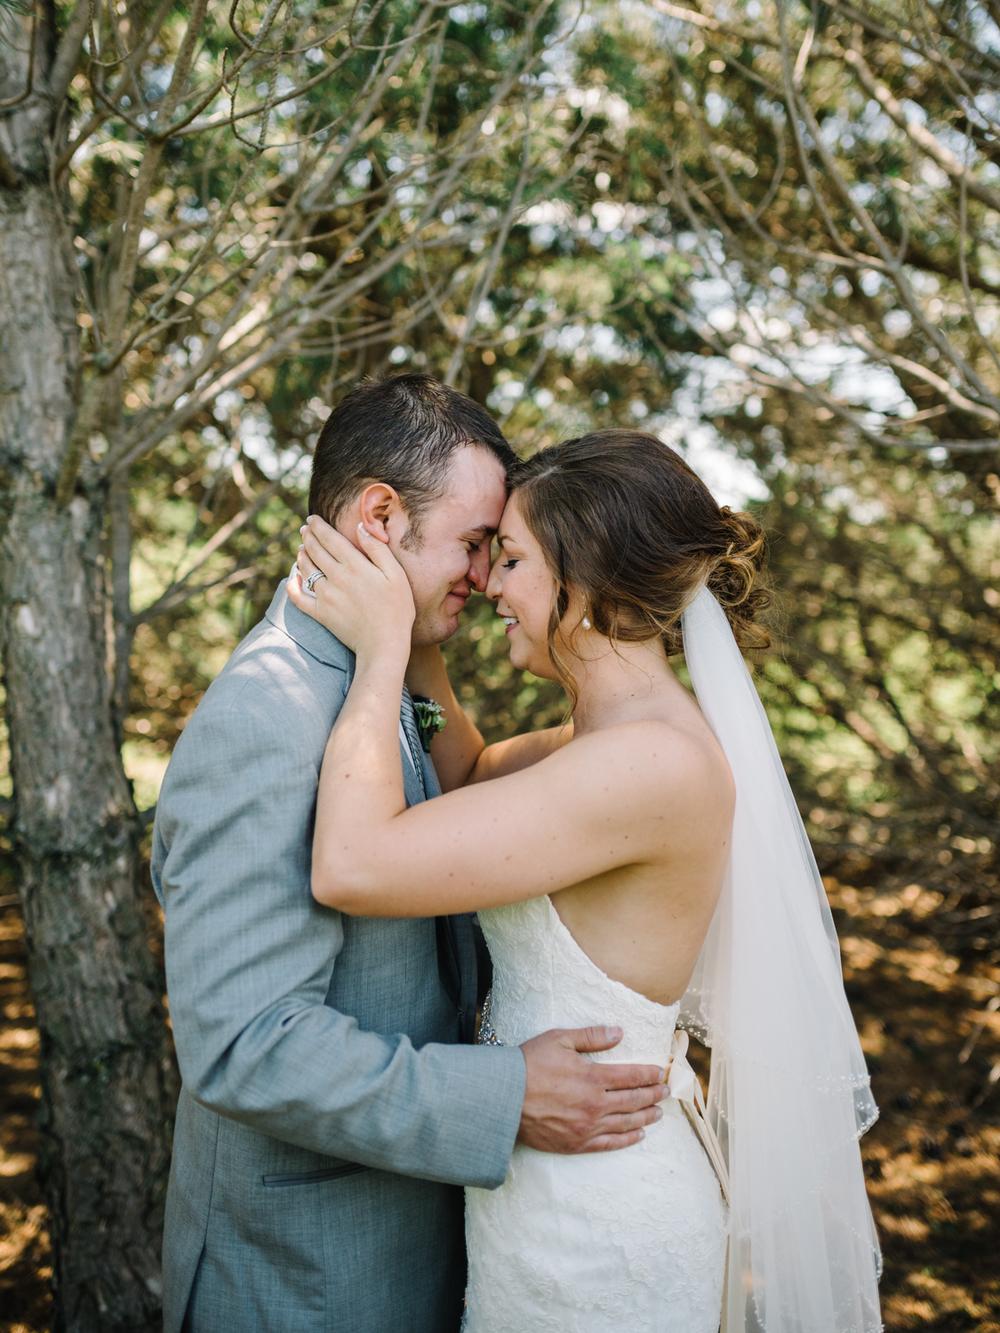 Dodge City, Kansas Wedding-Neal Dieker-Western Kansas Wedding Photographer-Dodge City, Kansas Wedding Photography-Wichita, Kansas Wedding Photographer-221.jpg